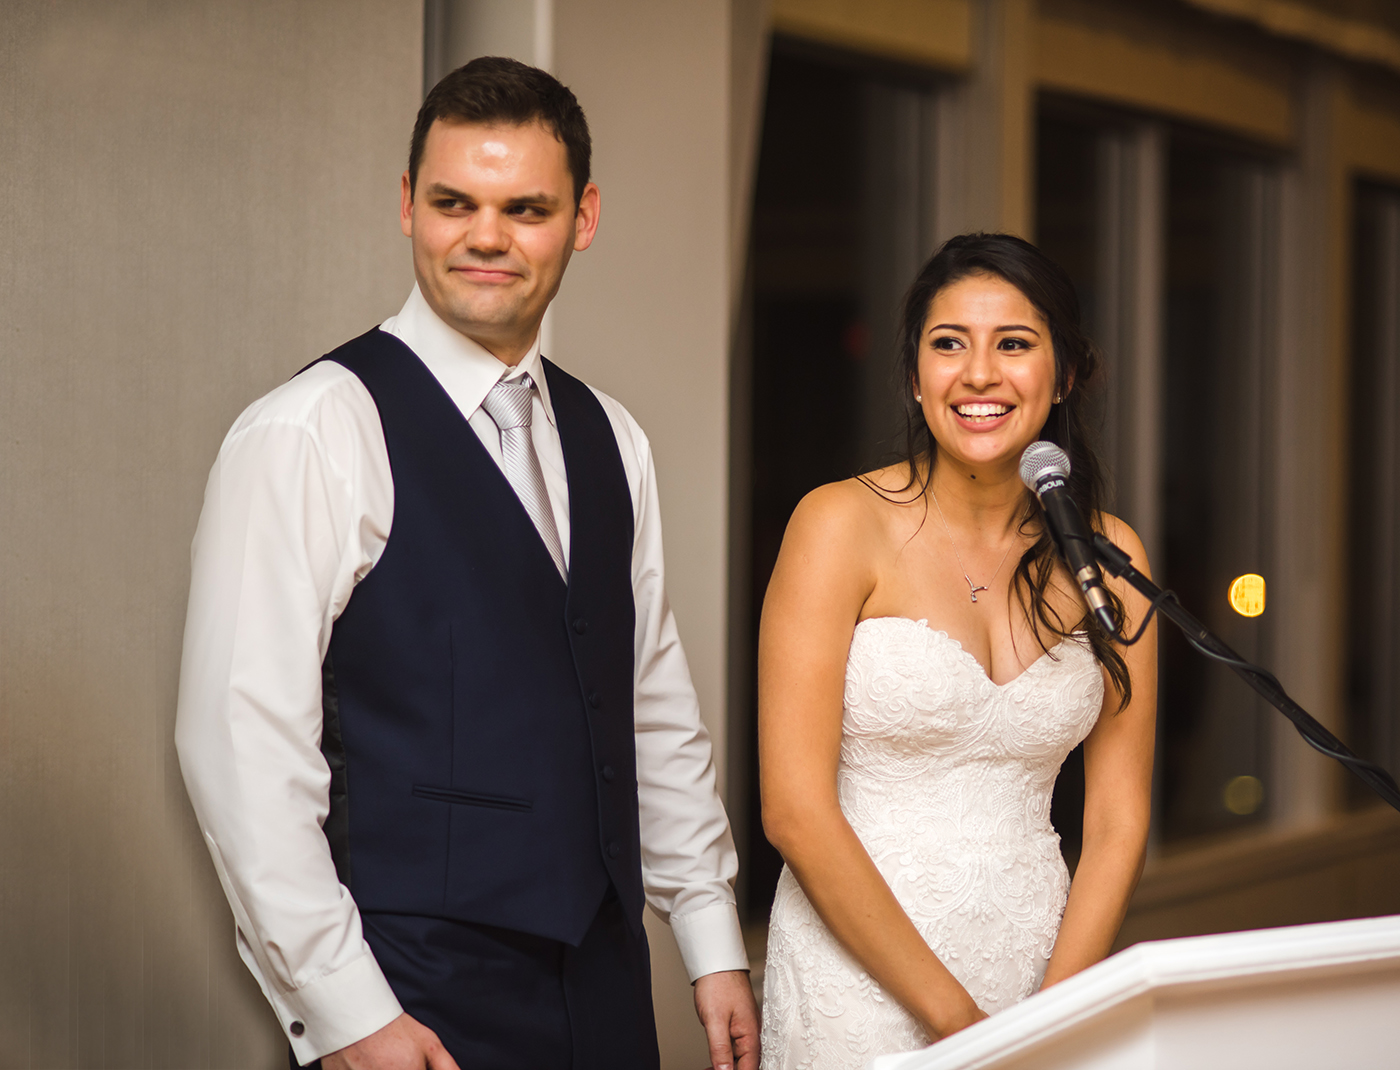 Duncan+&+Gabriela's+Wedding+Oakville+Ontario+Wedding+Photography+Aidan+Hennebry+Hush+Hush+Photography+&+Film.jpg